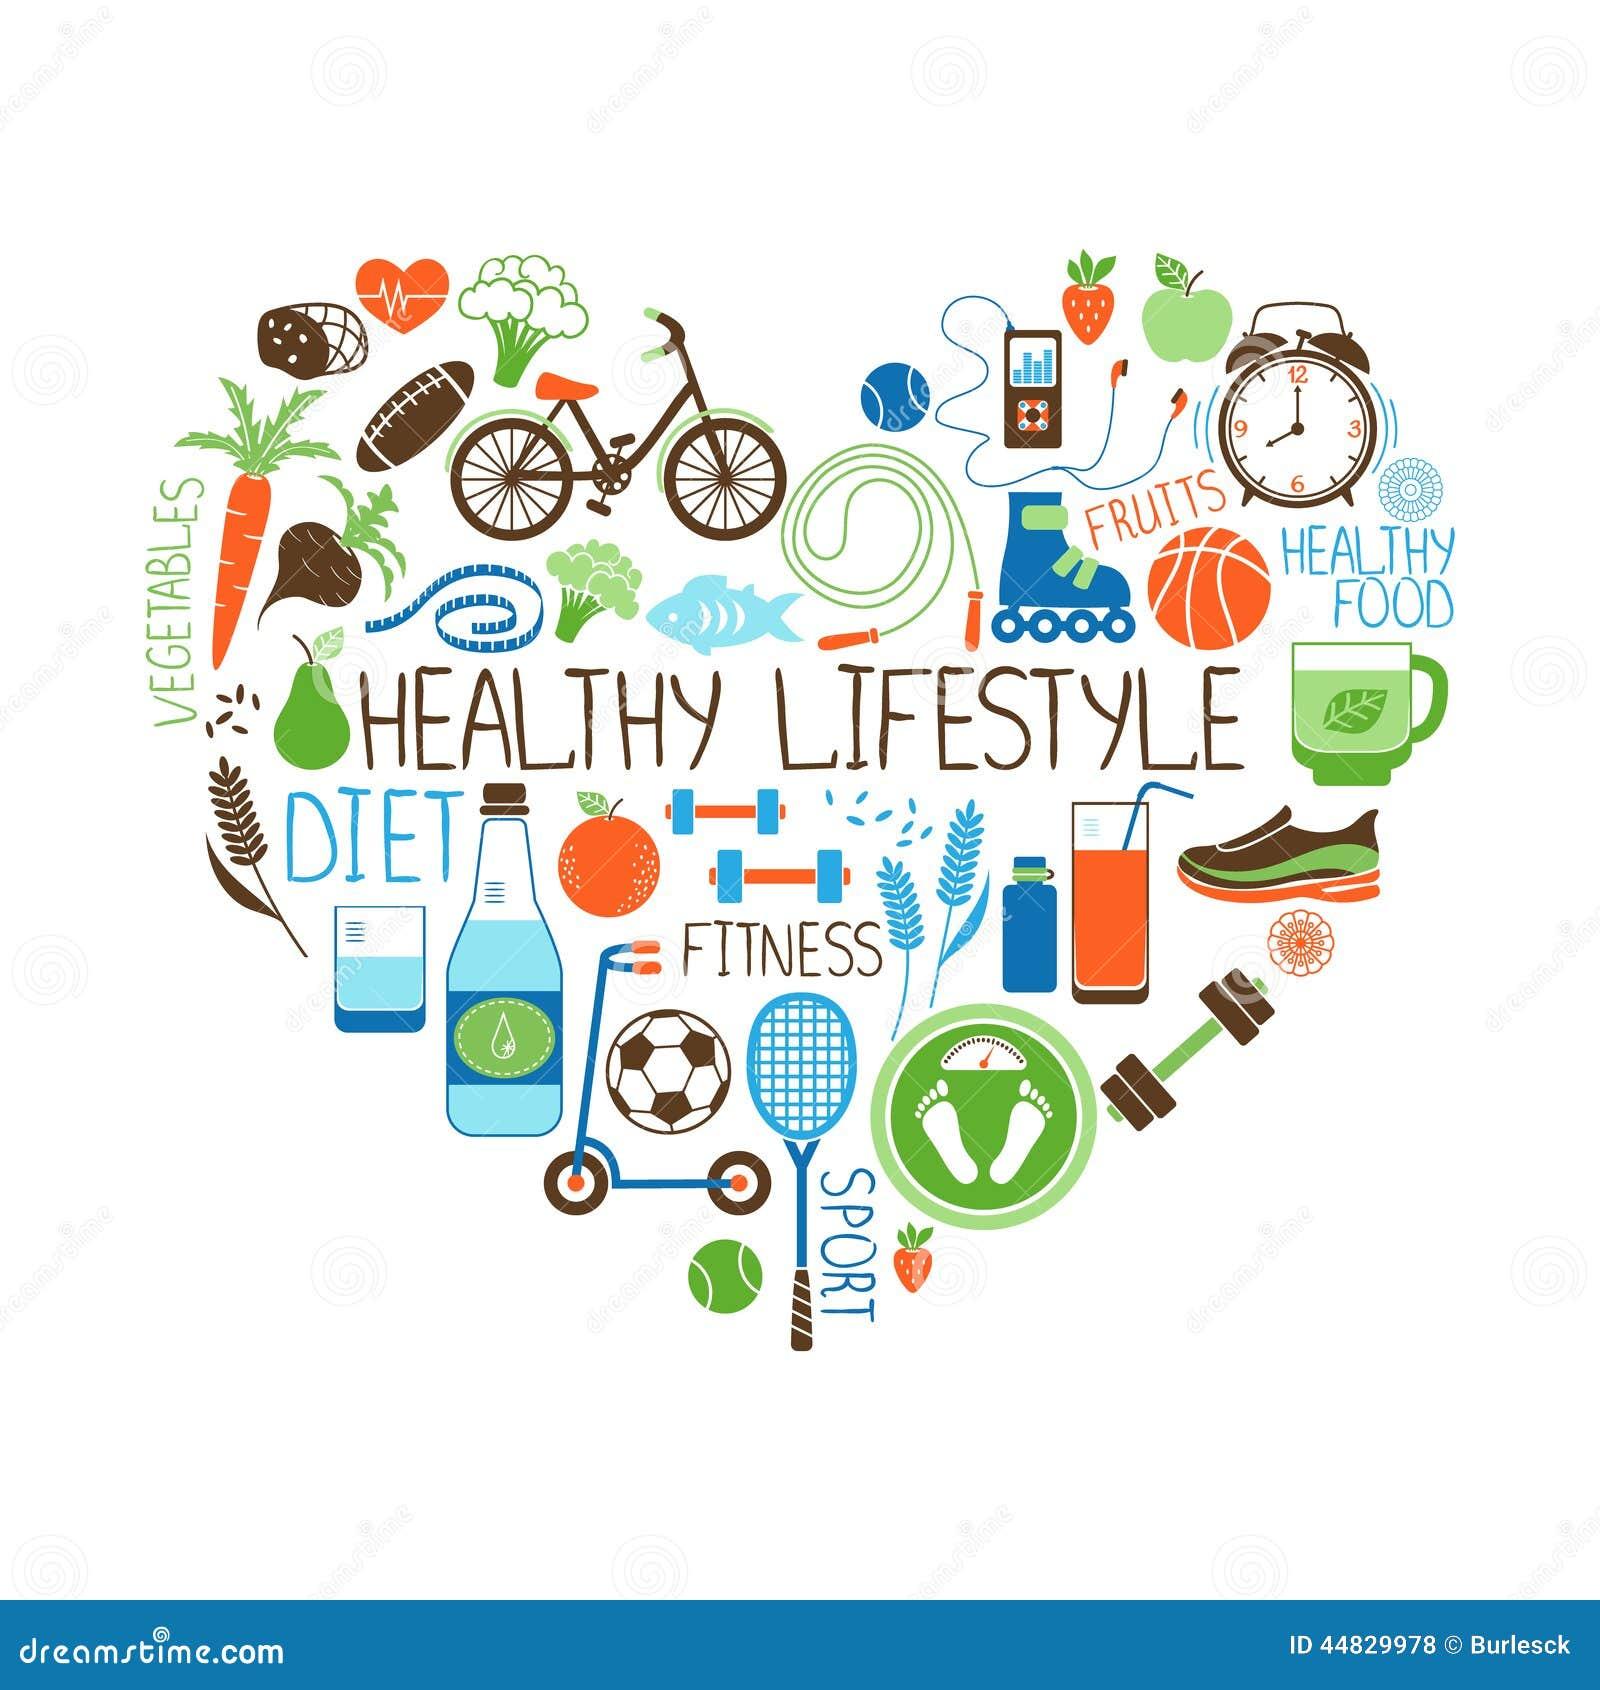 Dieta e prostatite: cause, disturbi e dieta da seguire